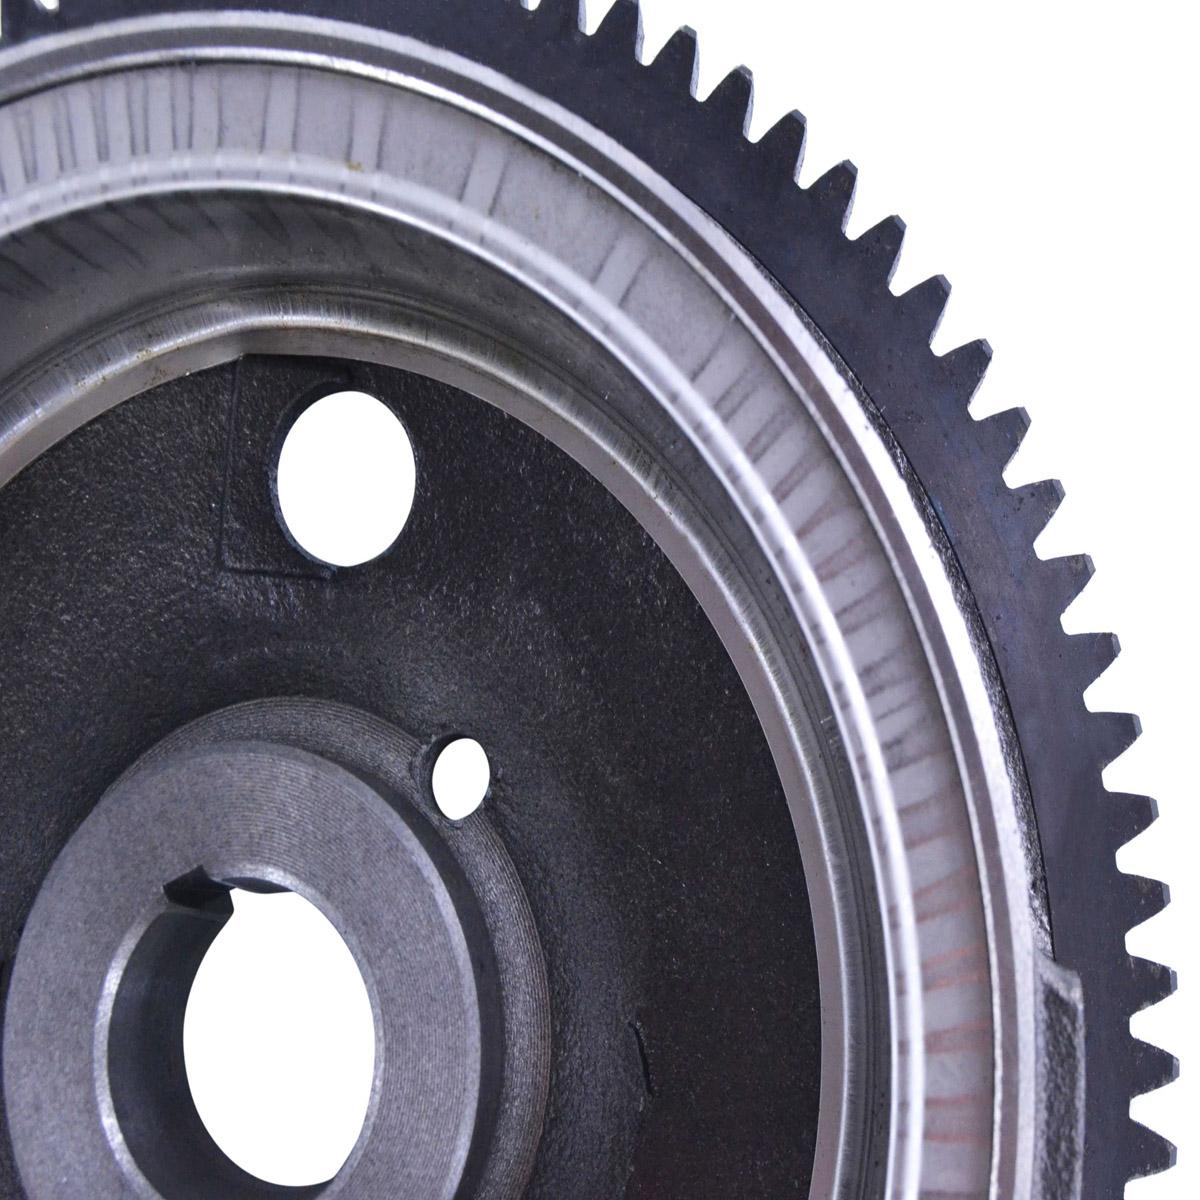 Kit Flywheel Flywheel Puller For Polaris ATP Big Boss Magnum Scrambler Sportsman HO Worker 400 500 FF97 1997 1998 1999 2000 2001 2002 2003 2004 OEM Repl.# 3085558 3086819 3086983 3087166